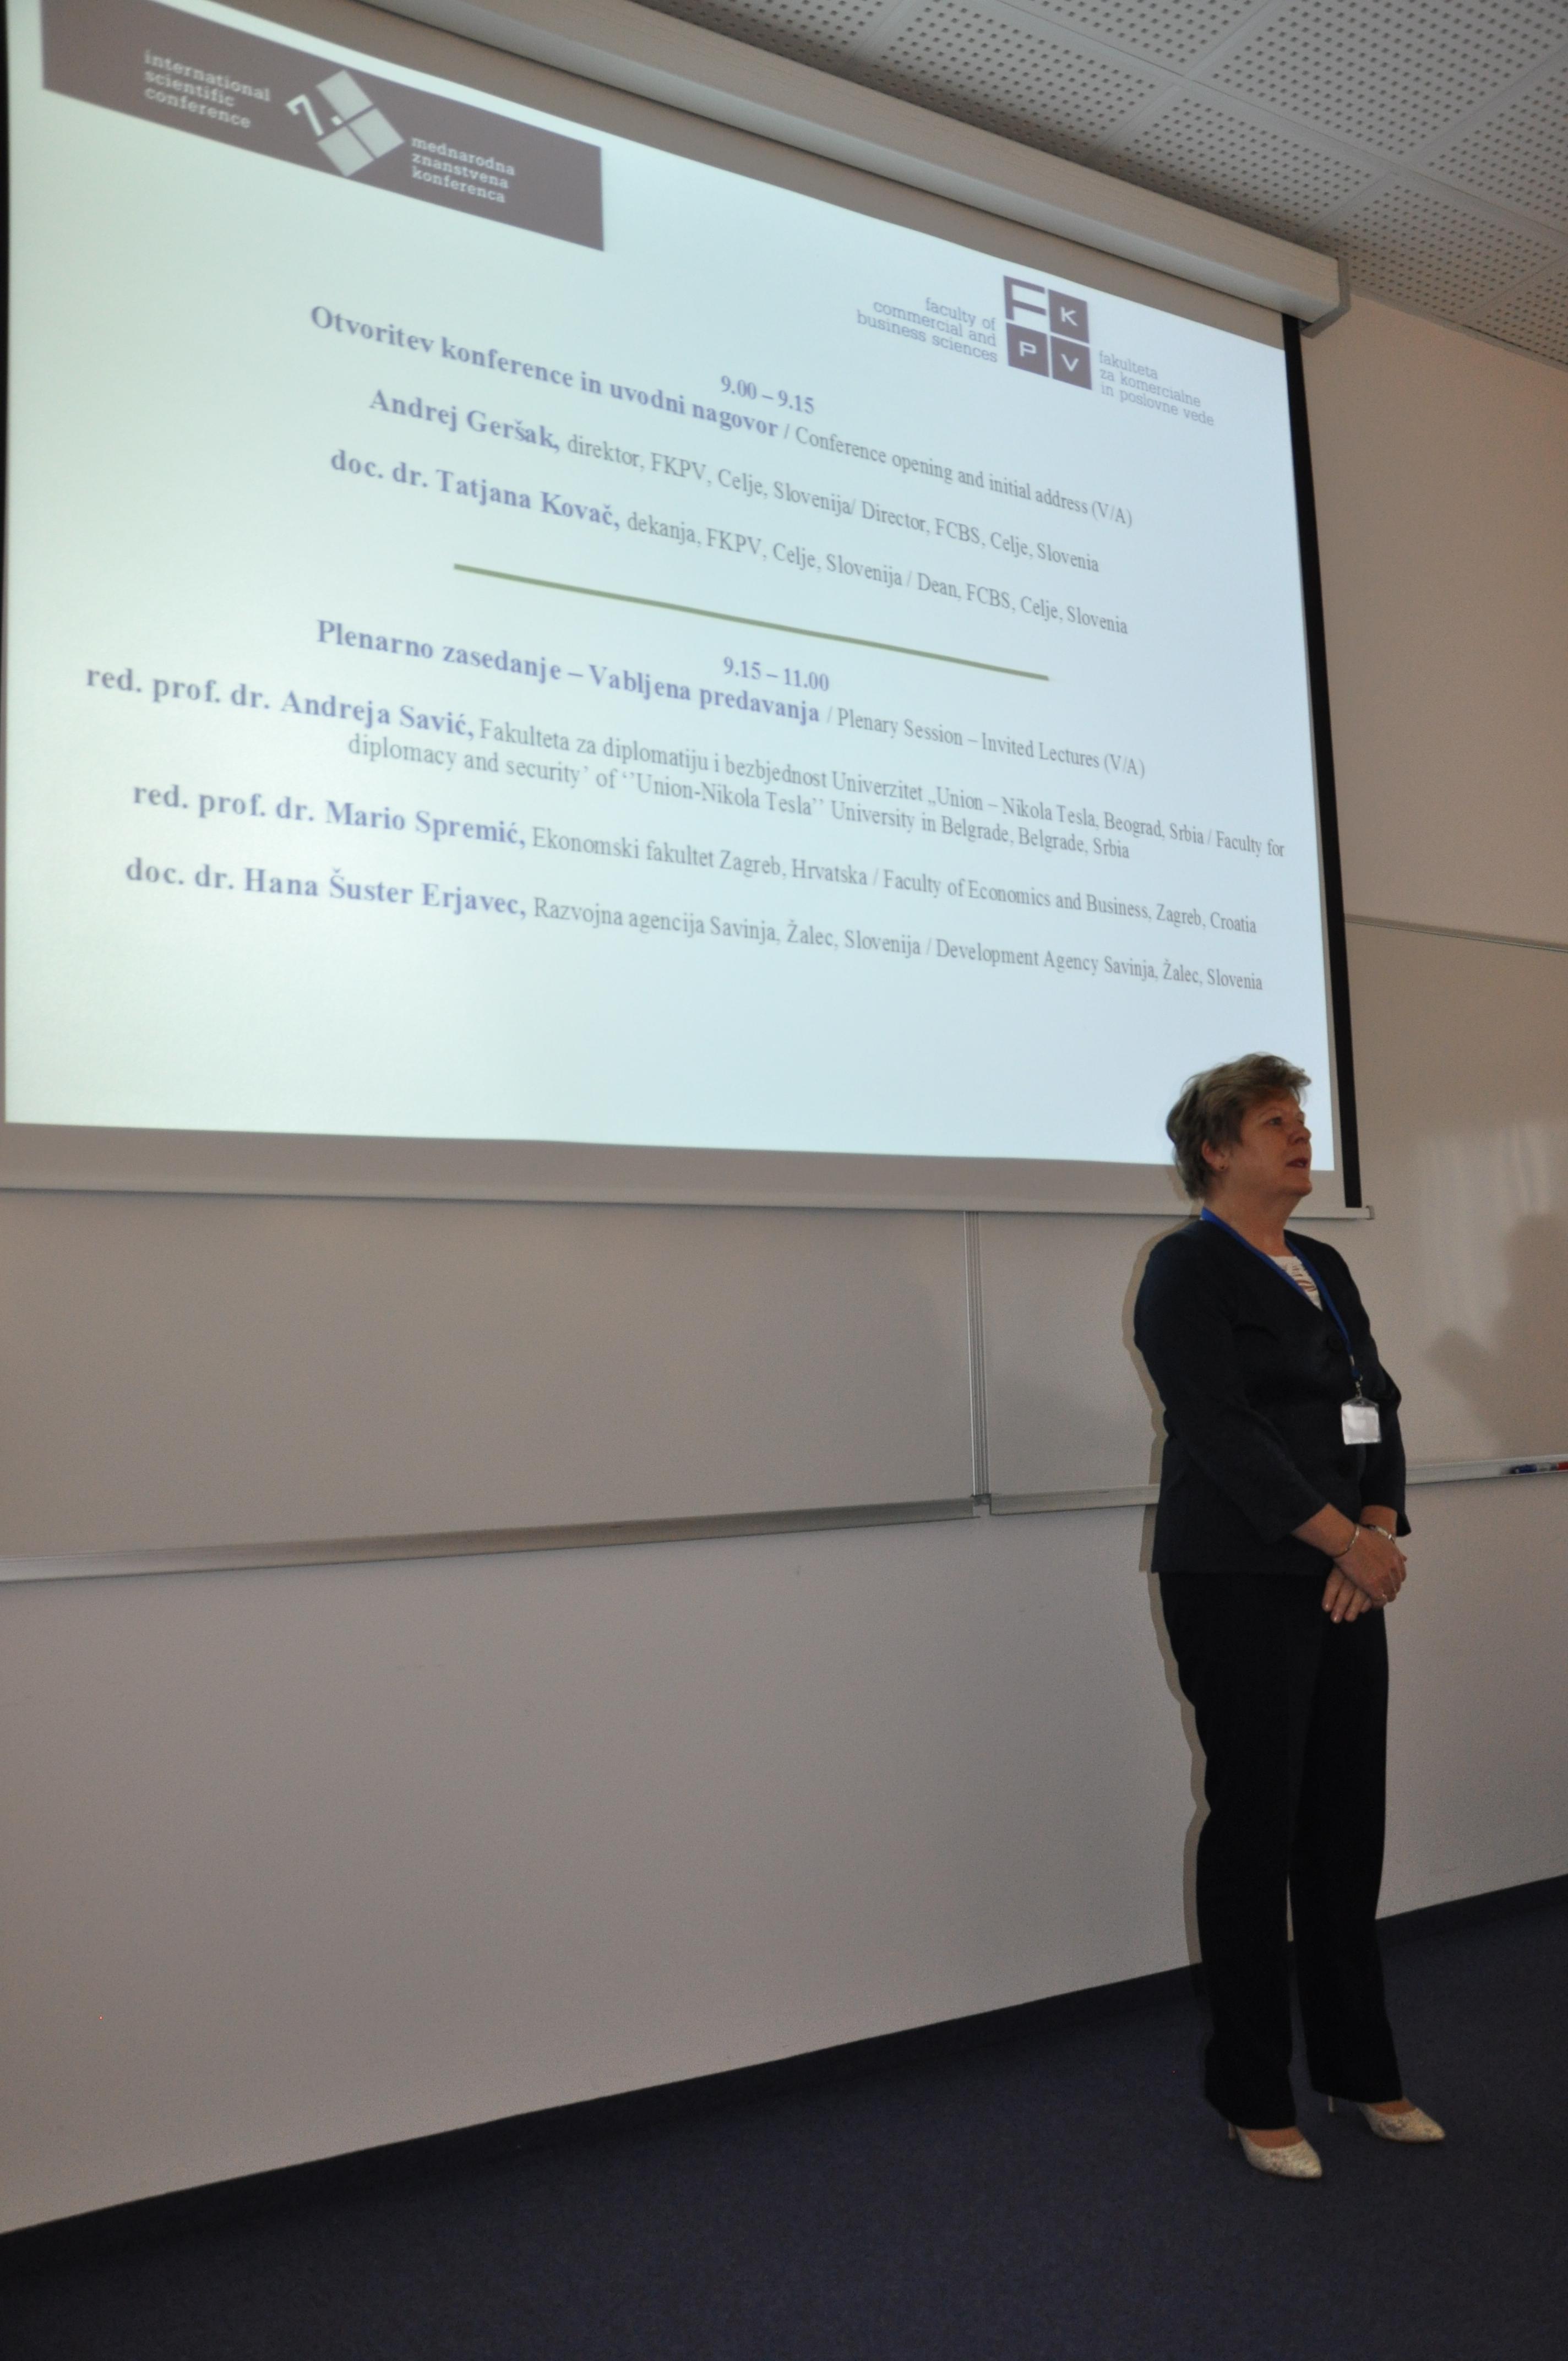 doc. dr. Tatjana Kovač, predsednica programskega odbora konference